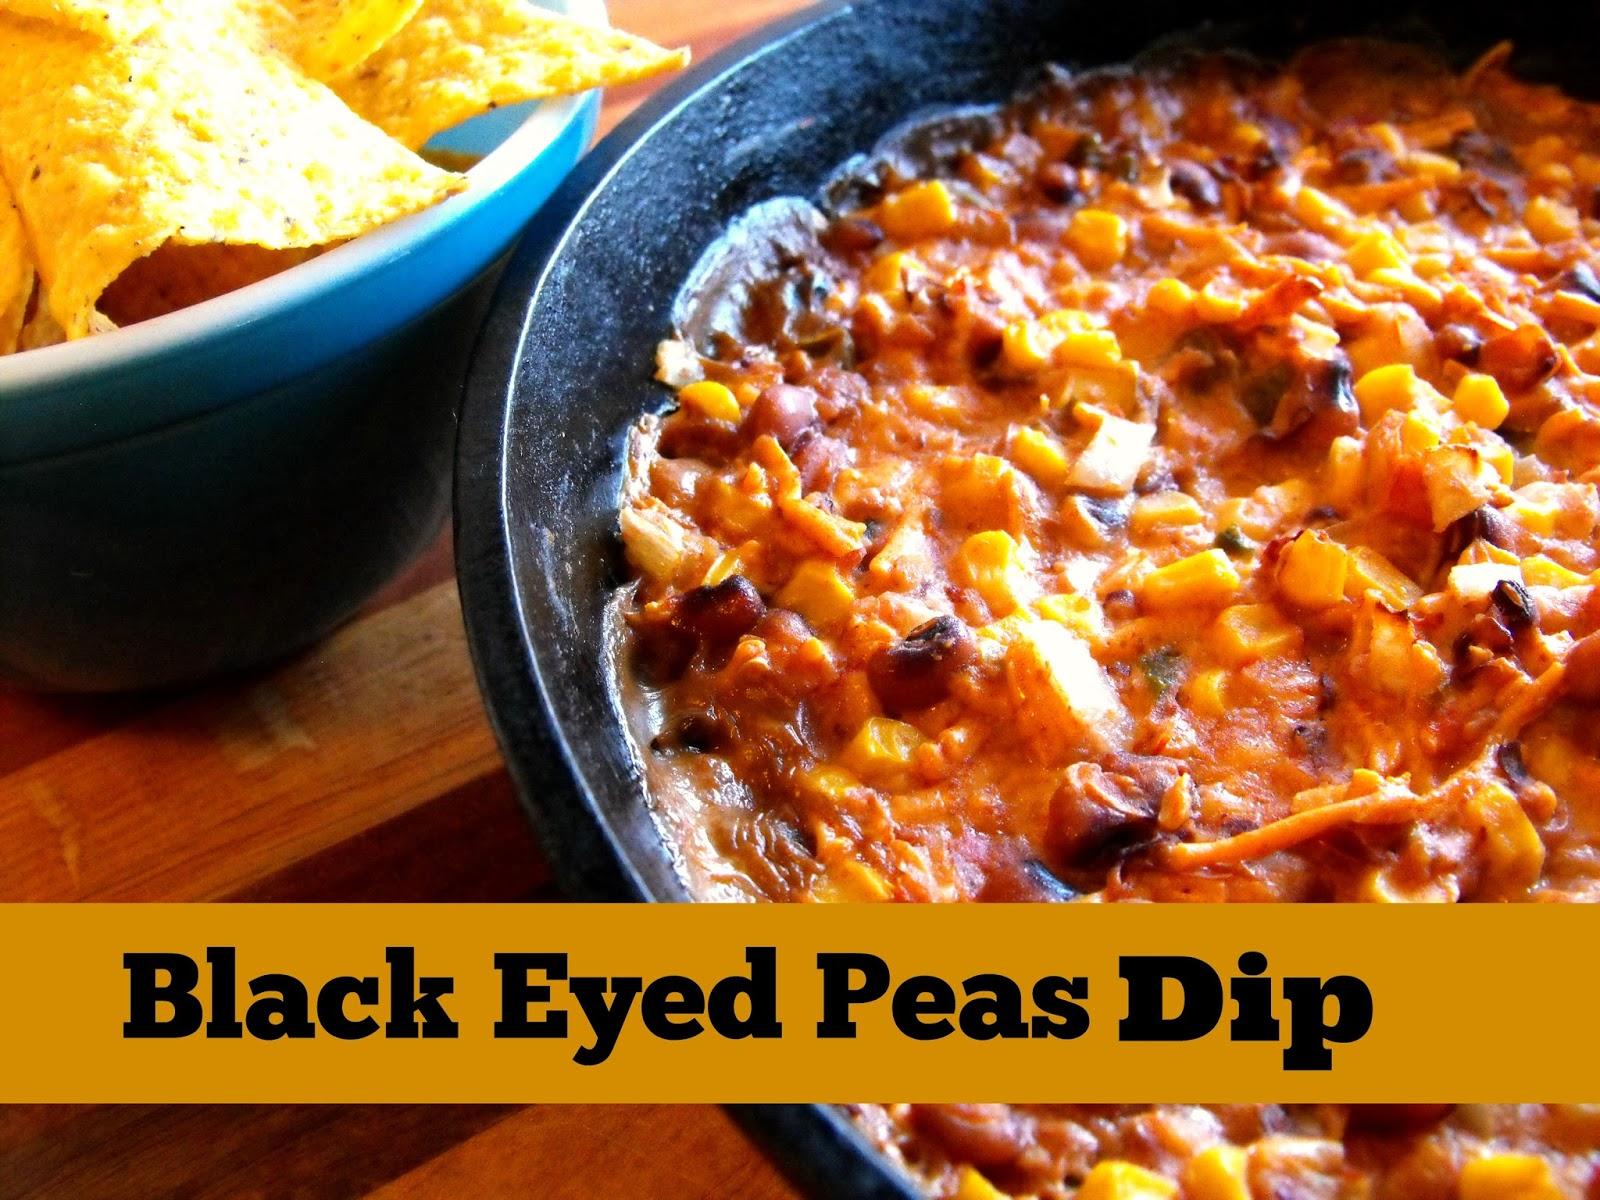 Black Eyed Peas Dip | BlogHer